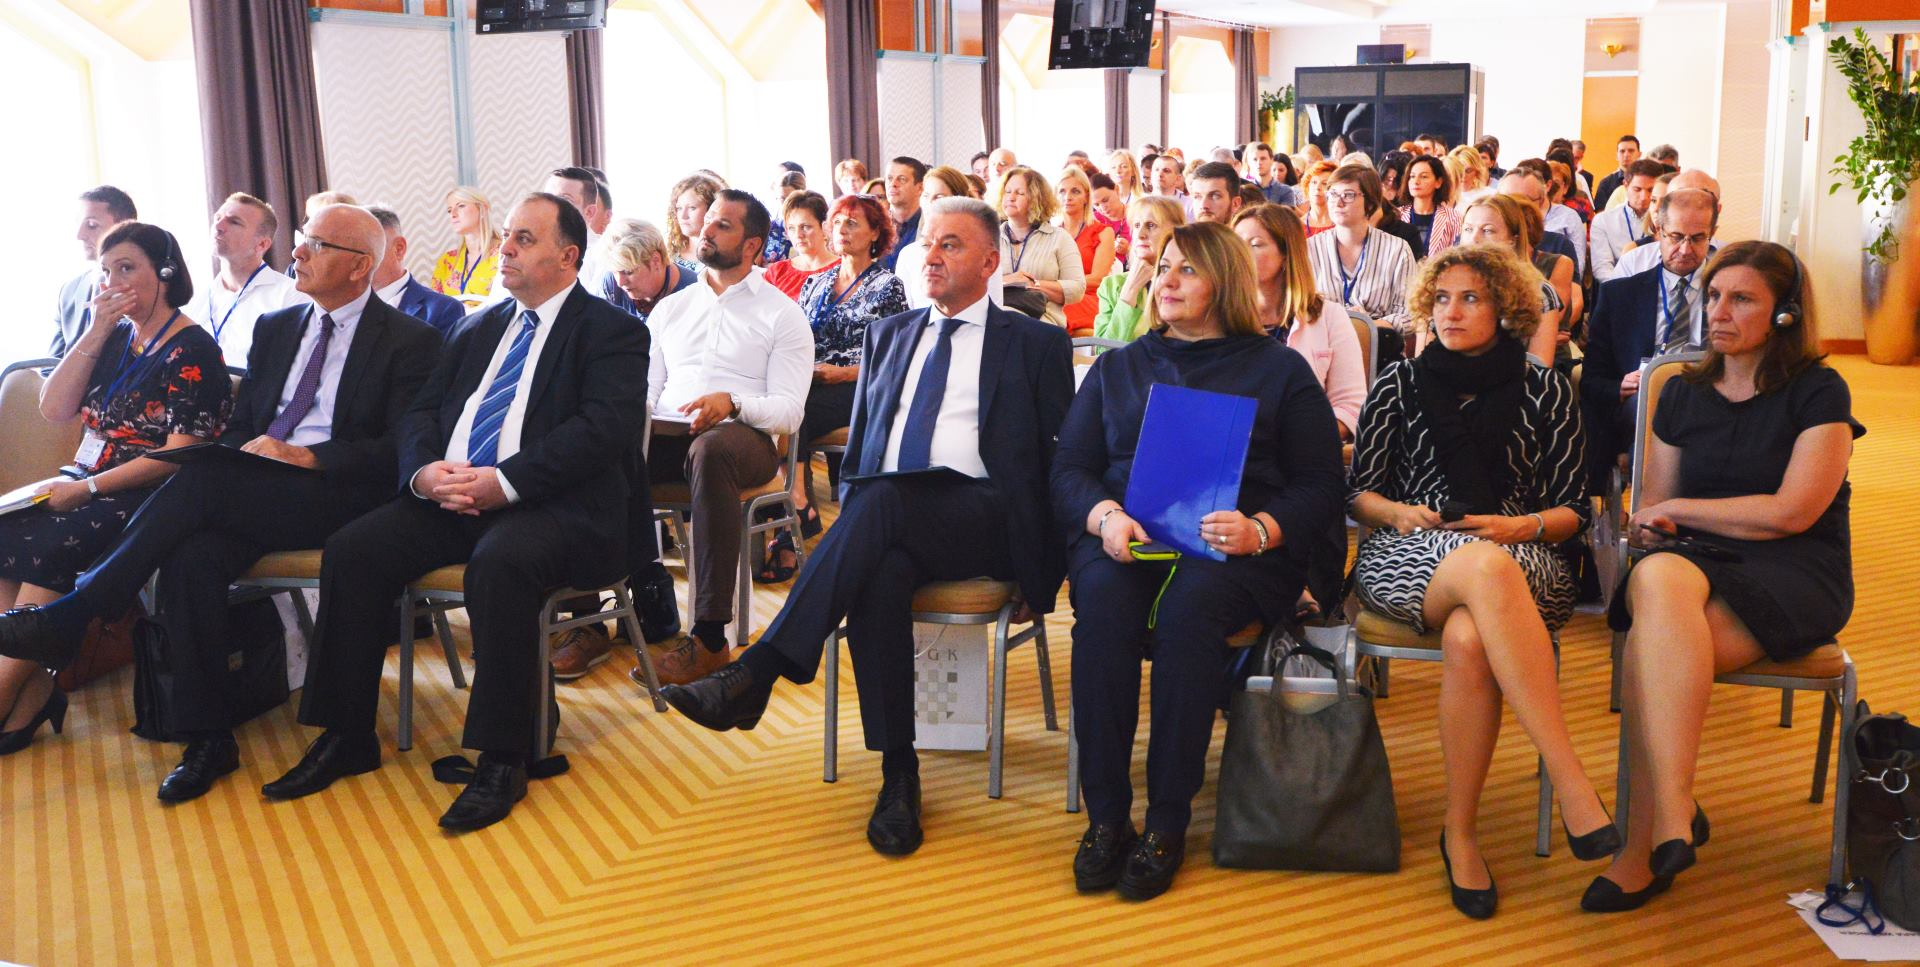 CAP4APP Održana završna konferencija projekta Erasmus+